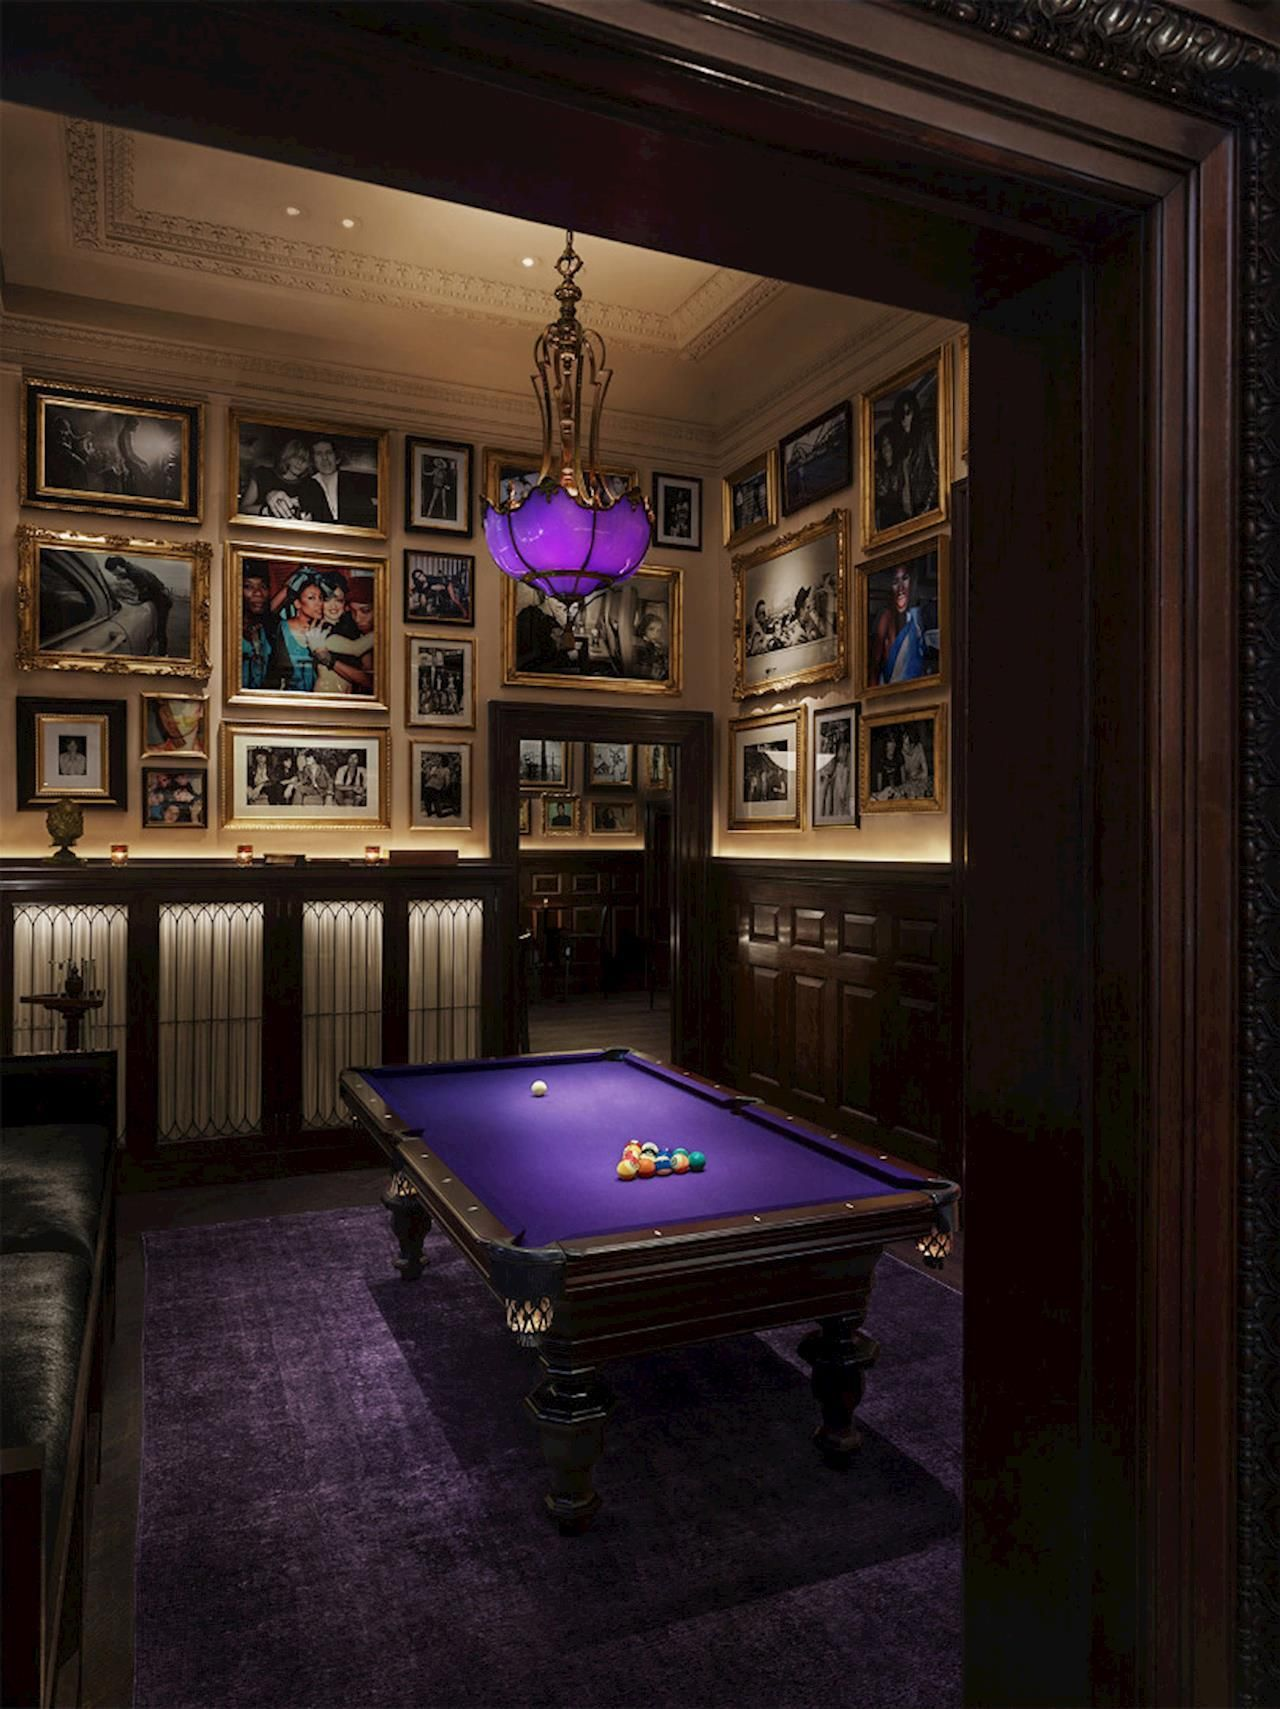 hotel-new-york-the-edition-billard | Interior decoration | Pinterest